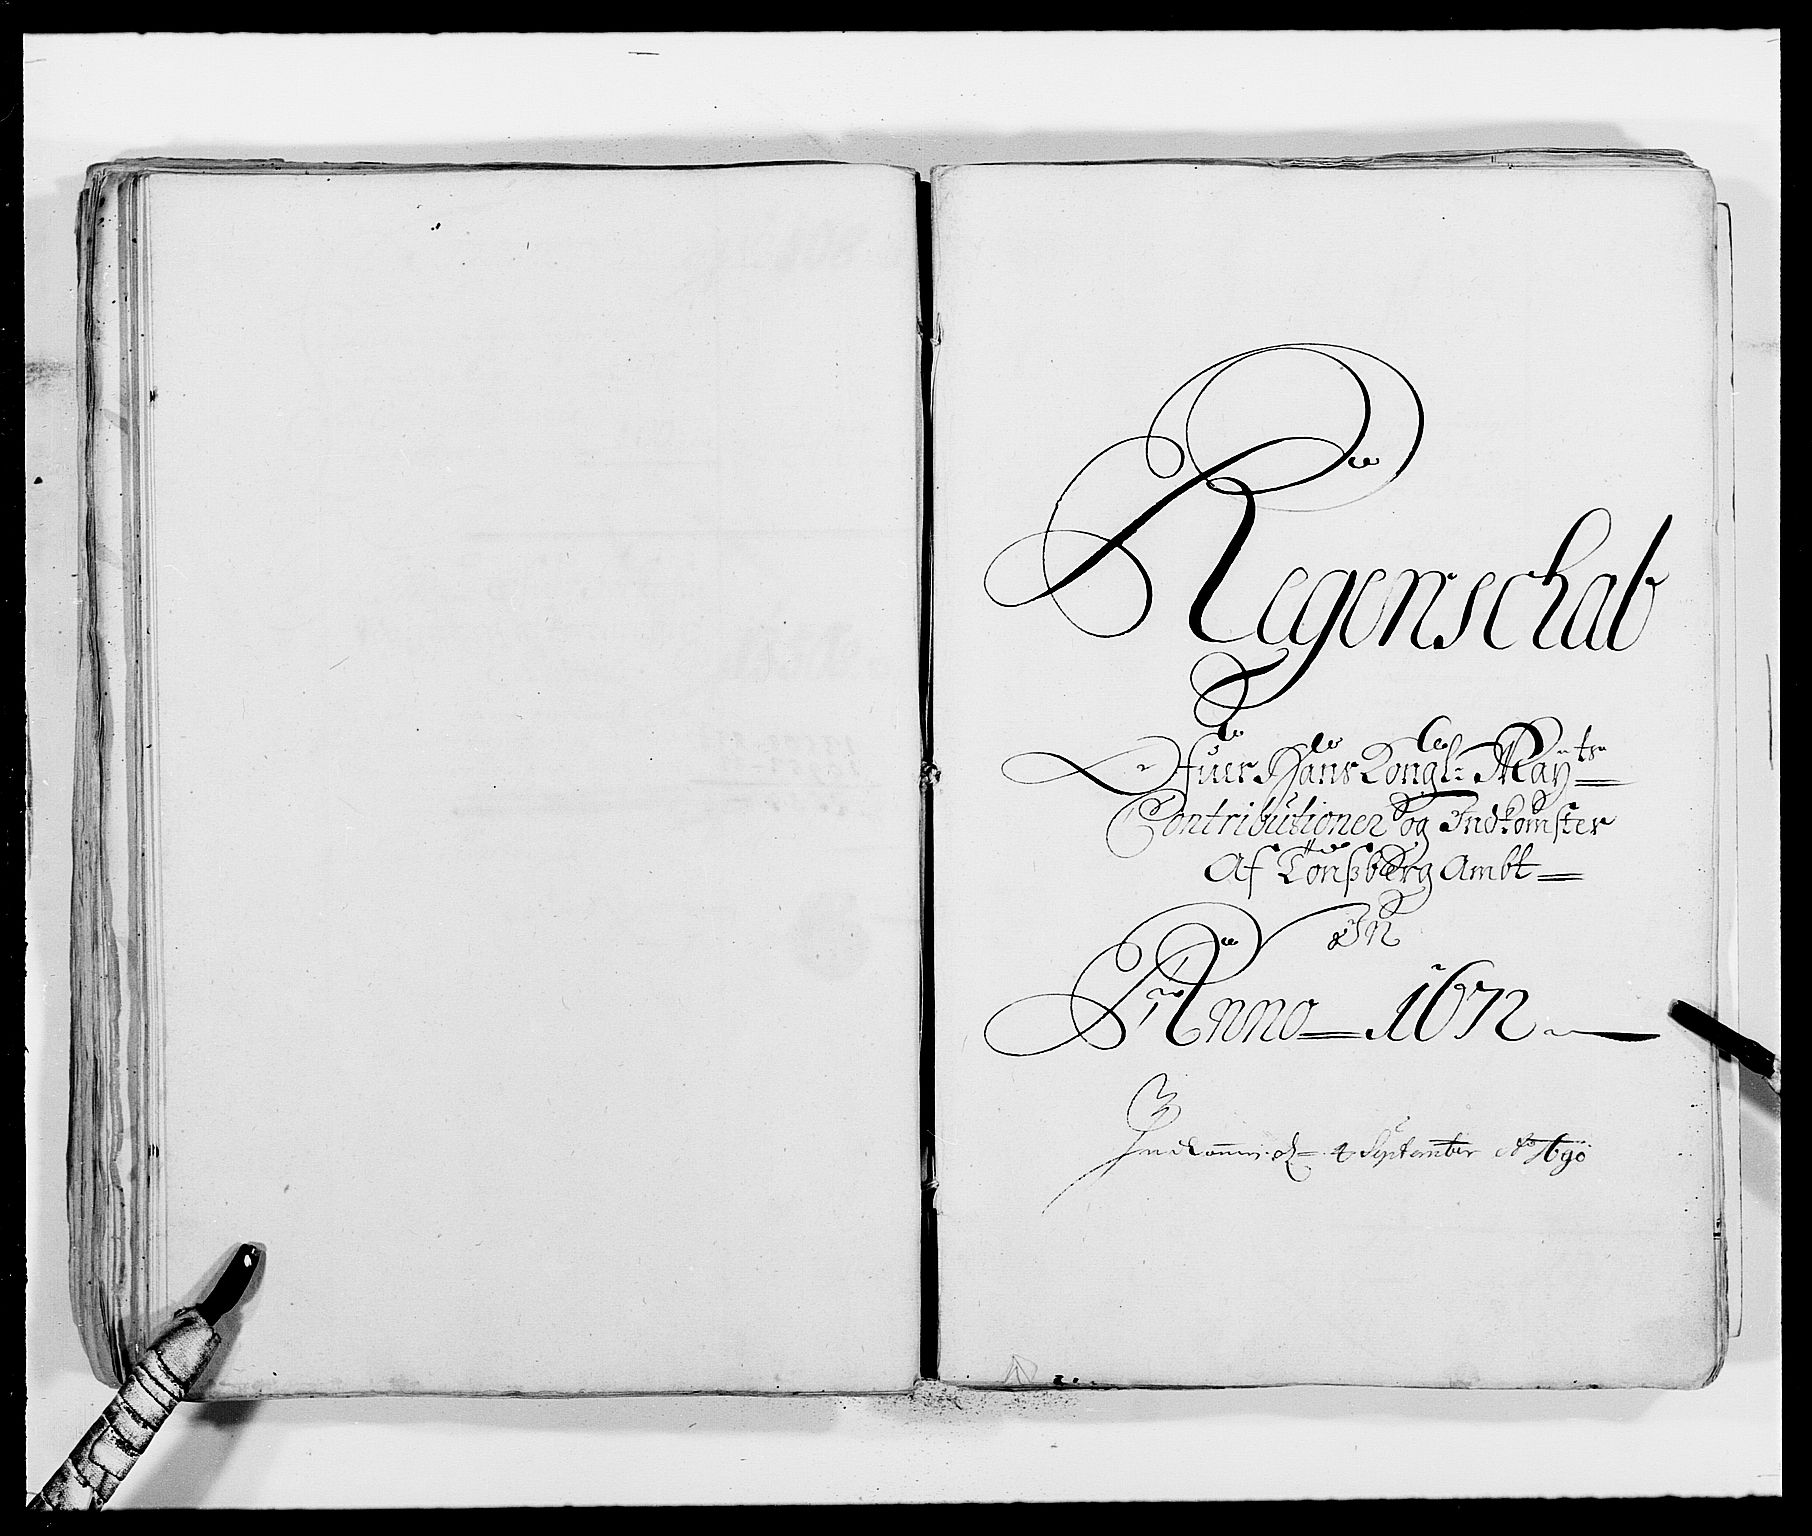 RA, Rentekammeret inntil 1814, Reviderte regnskaper, Fogderegnskap, R32/L1839: Fogderegnskap Jarlsberg grevskap, 1664-1673, s. 118